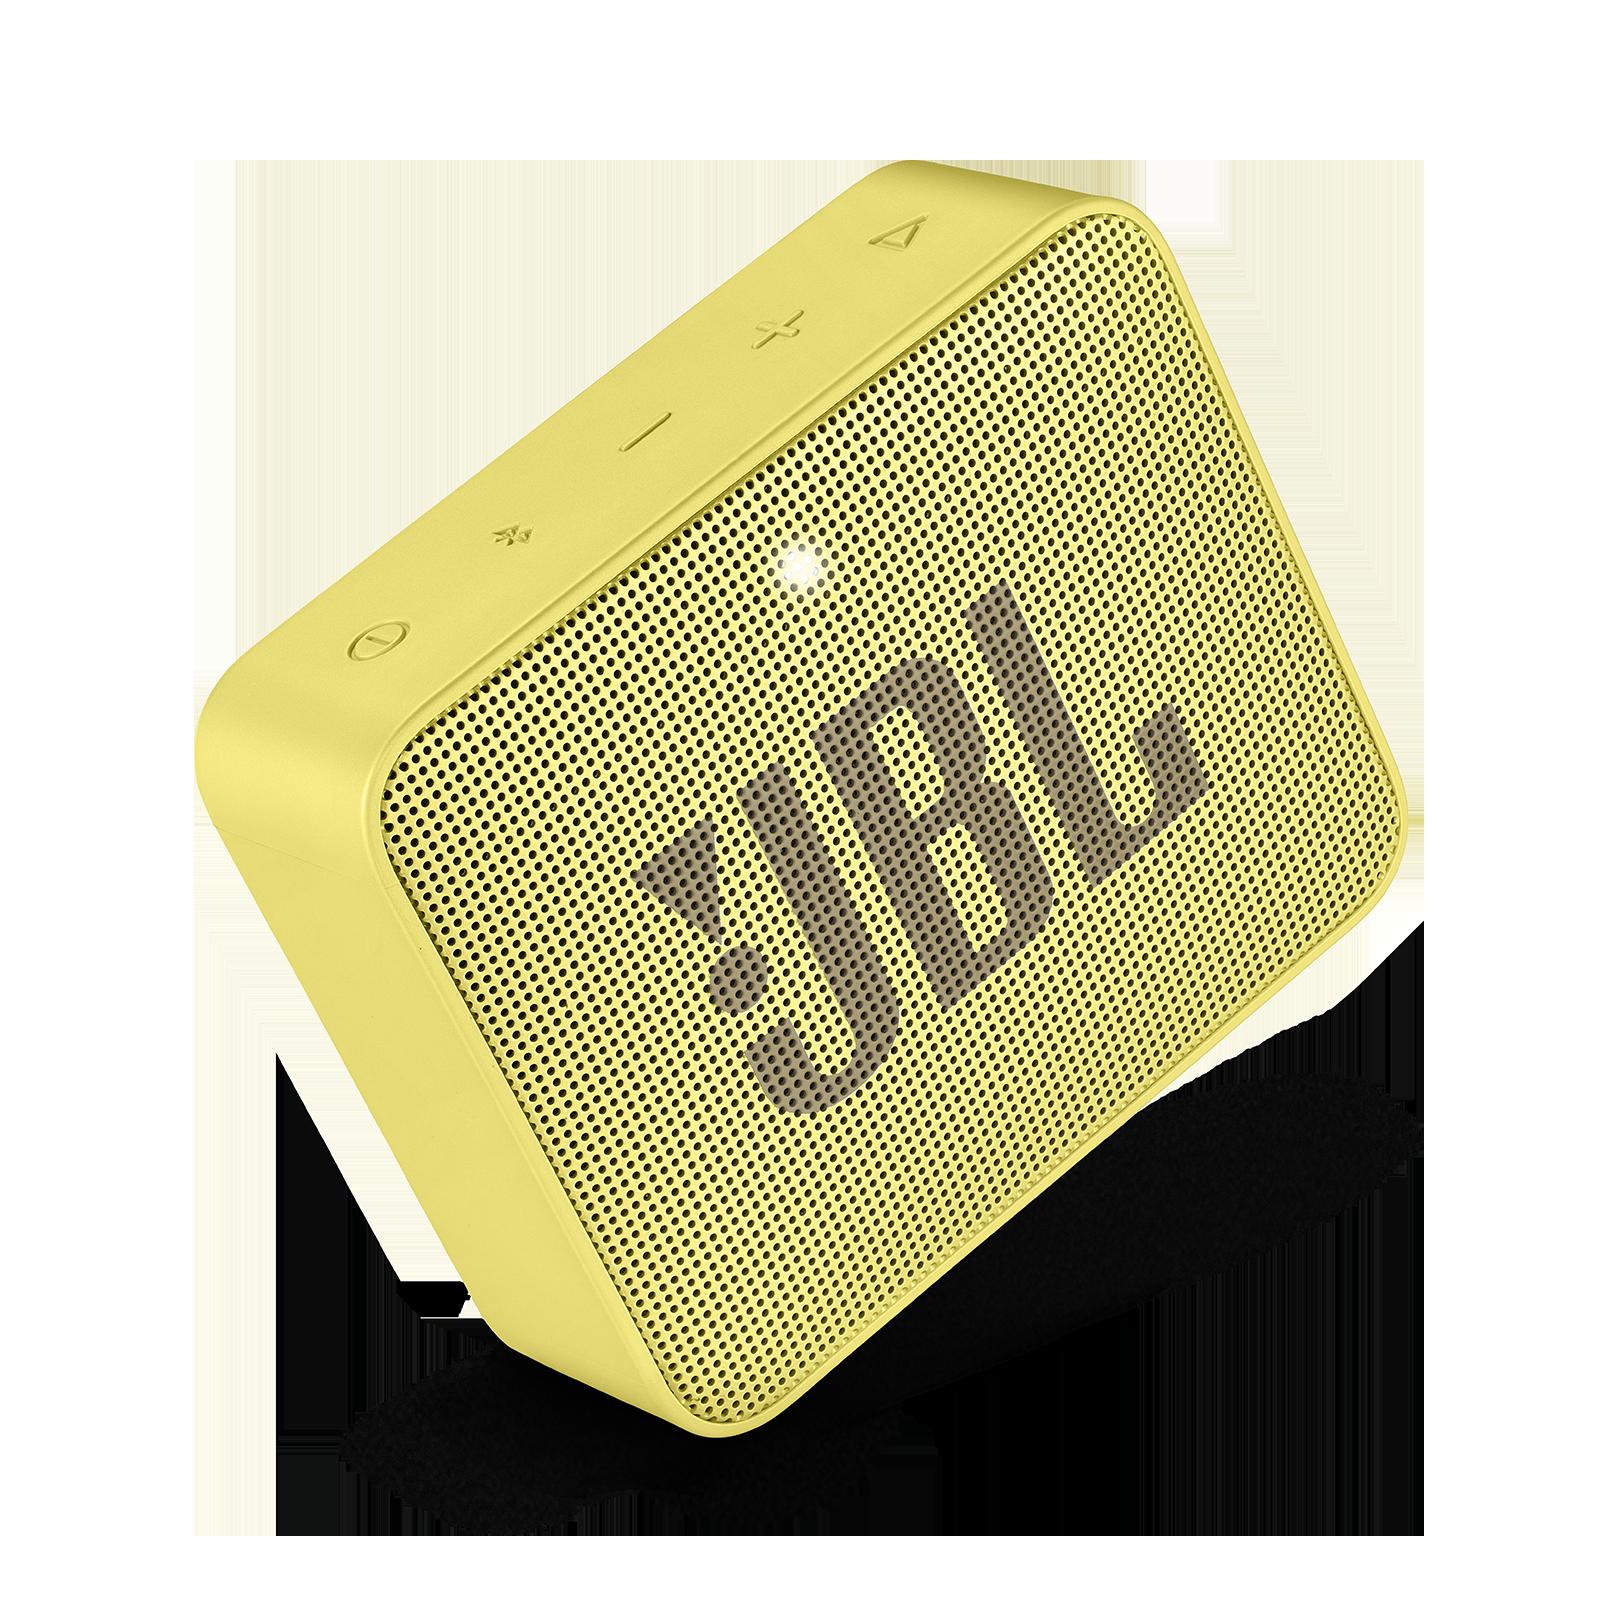 Enceinte Jbl Salle De Bain ~ jbl go 2 mini enceinte portable bluetooth